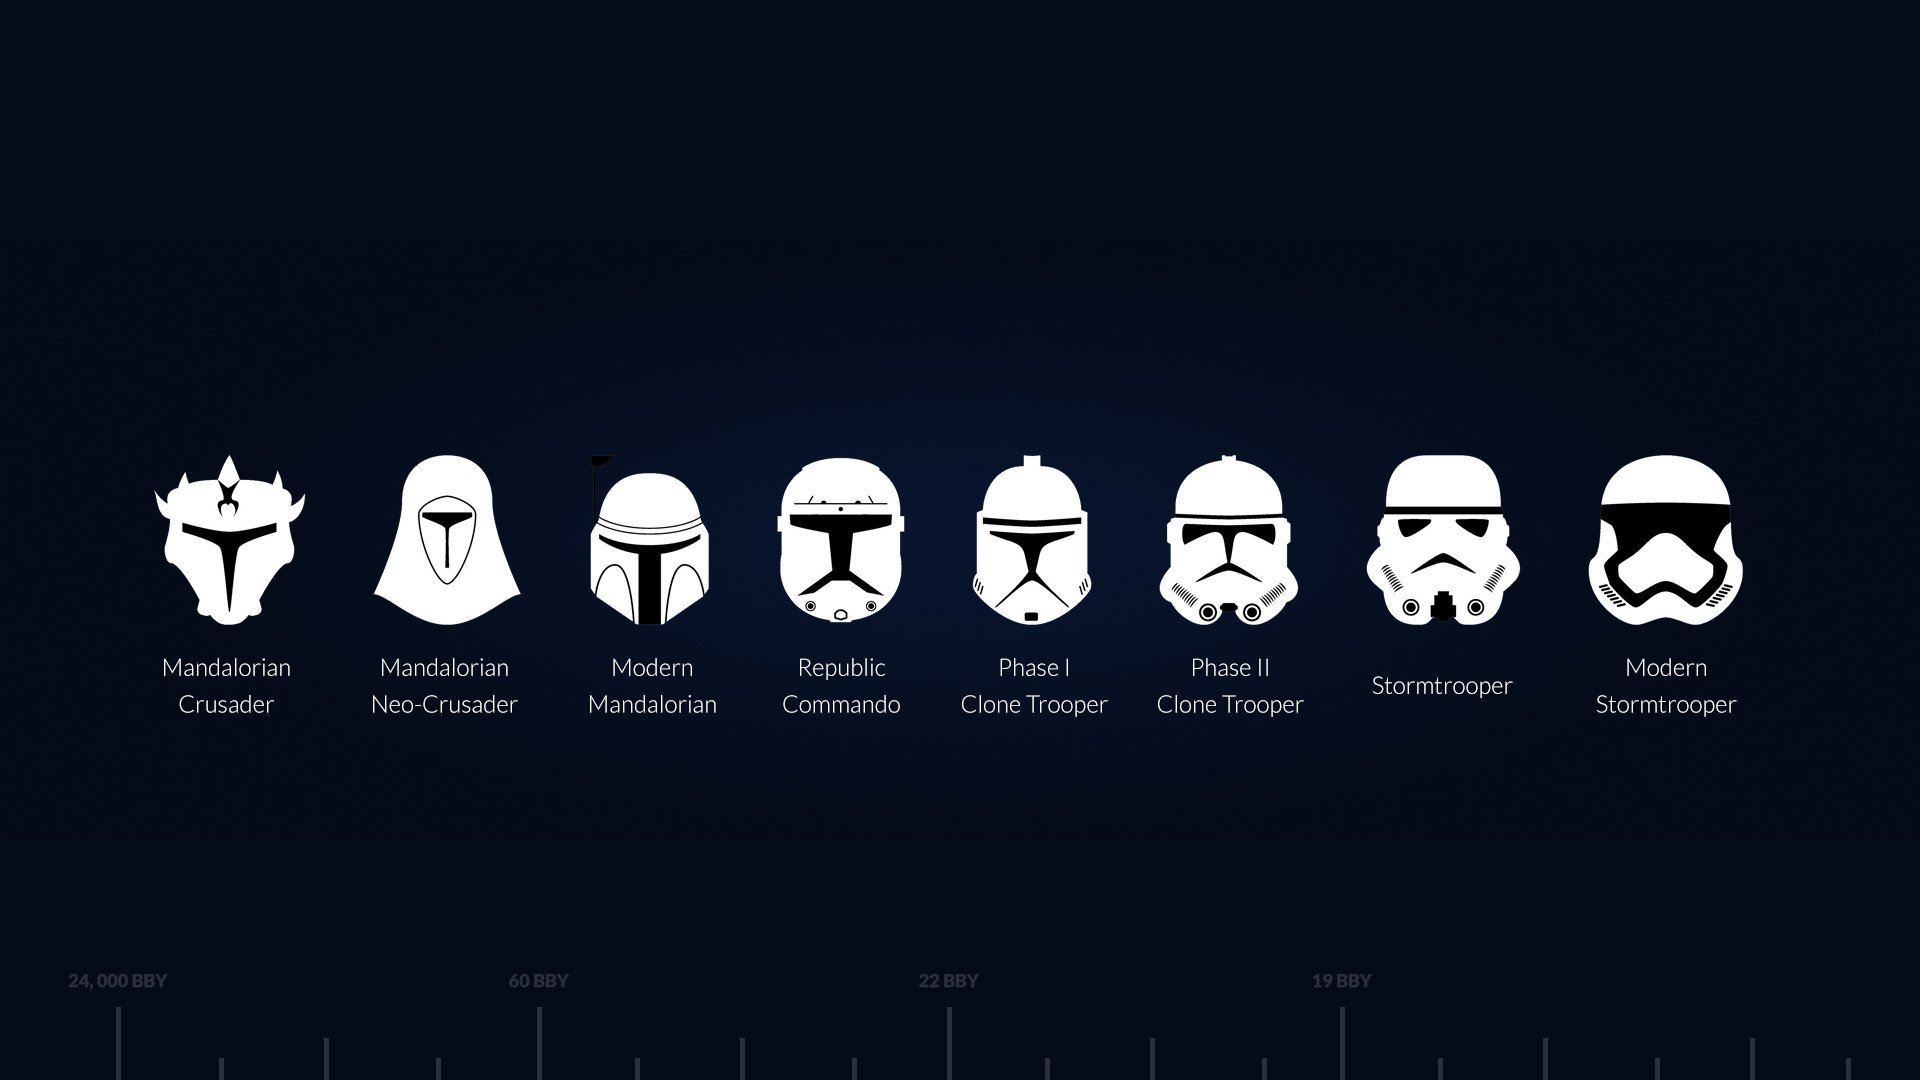 Star wars full hd fond d 39 cran and arri re plan - Stormtrooper suit wallpaper ...